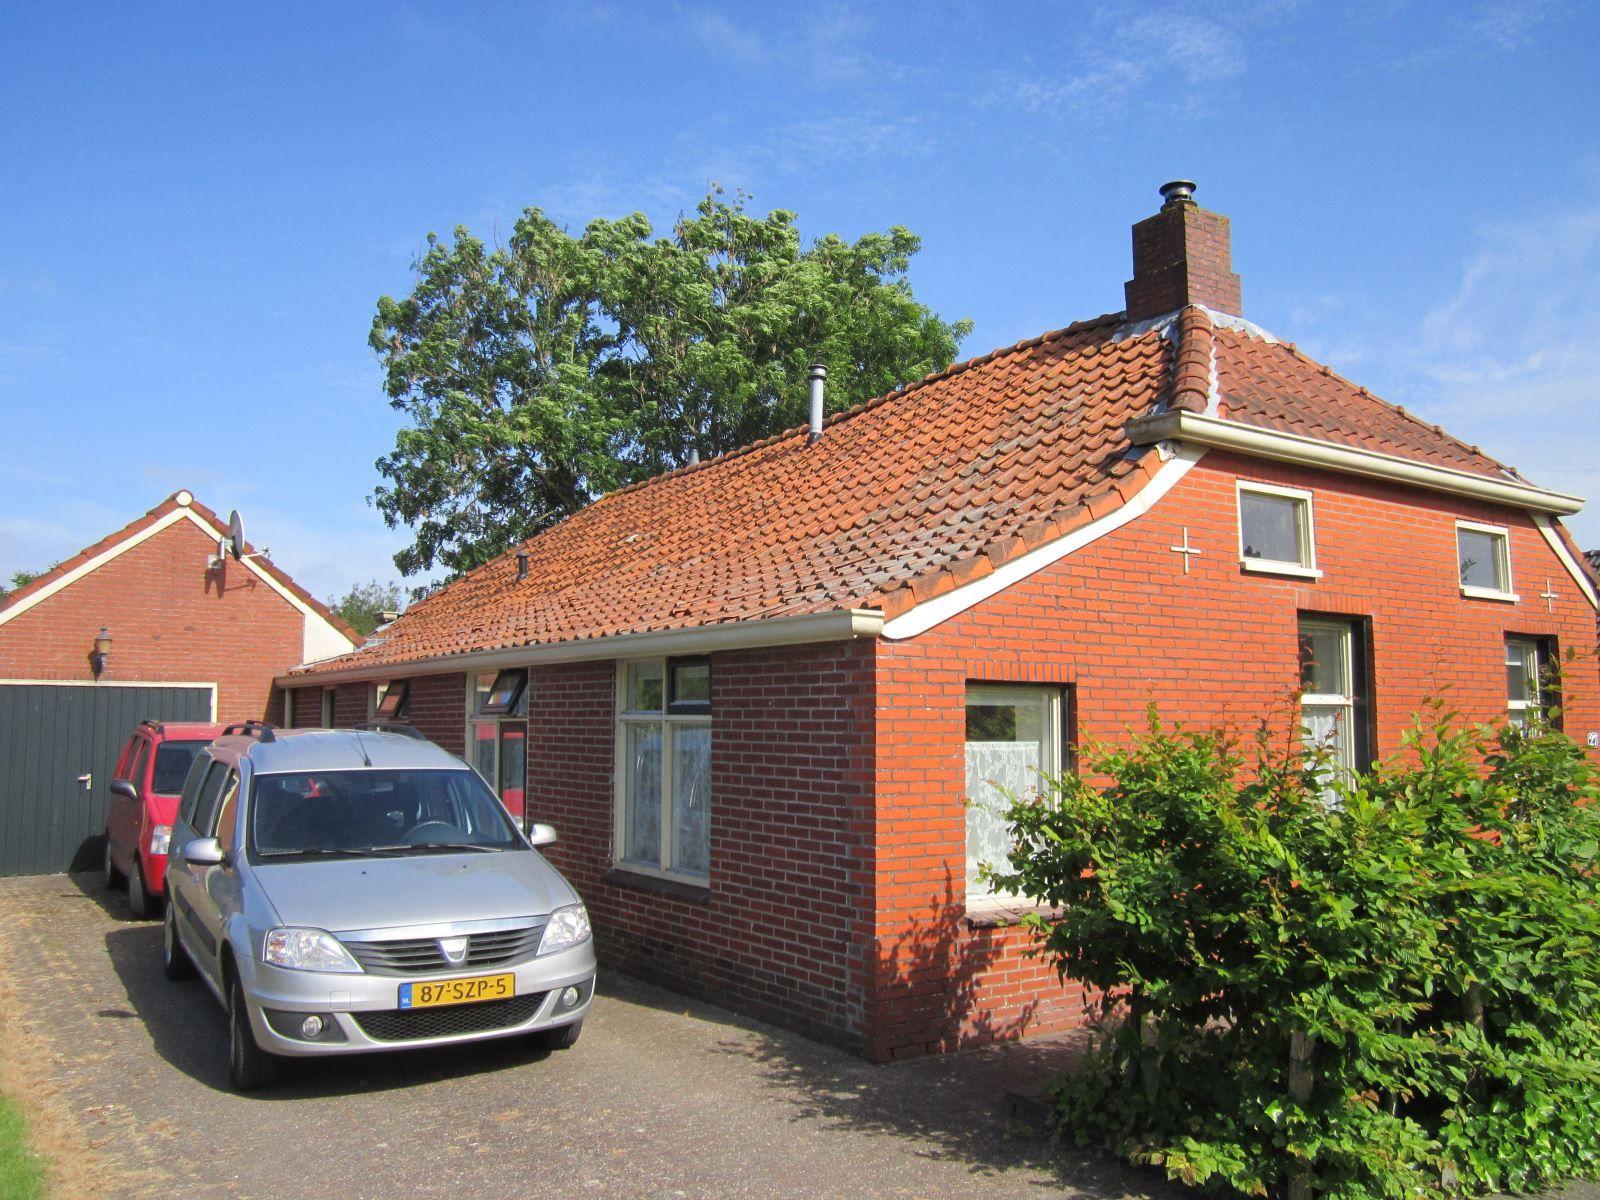 AE-weg 27, Woldendorp